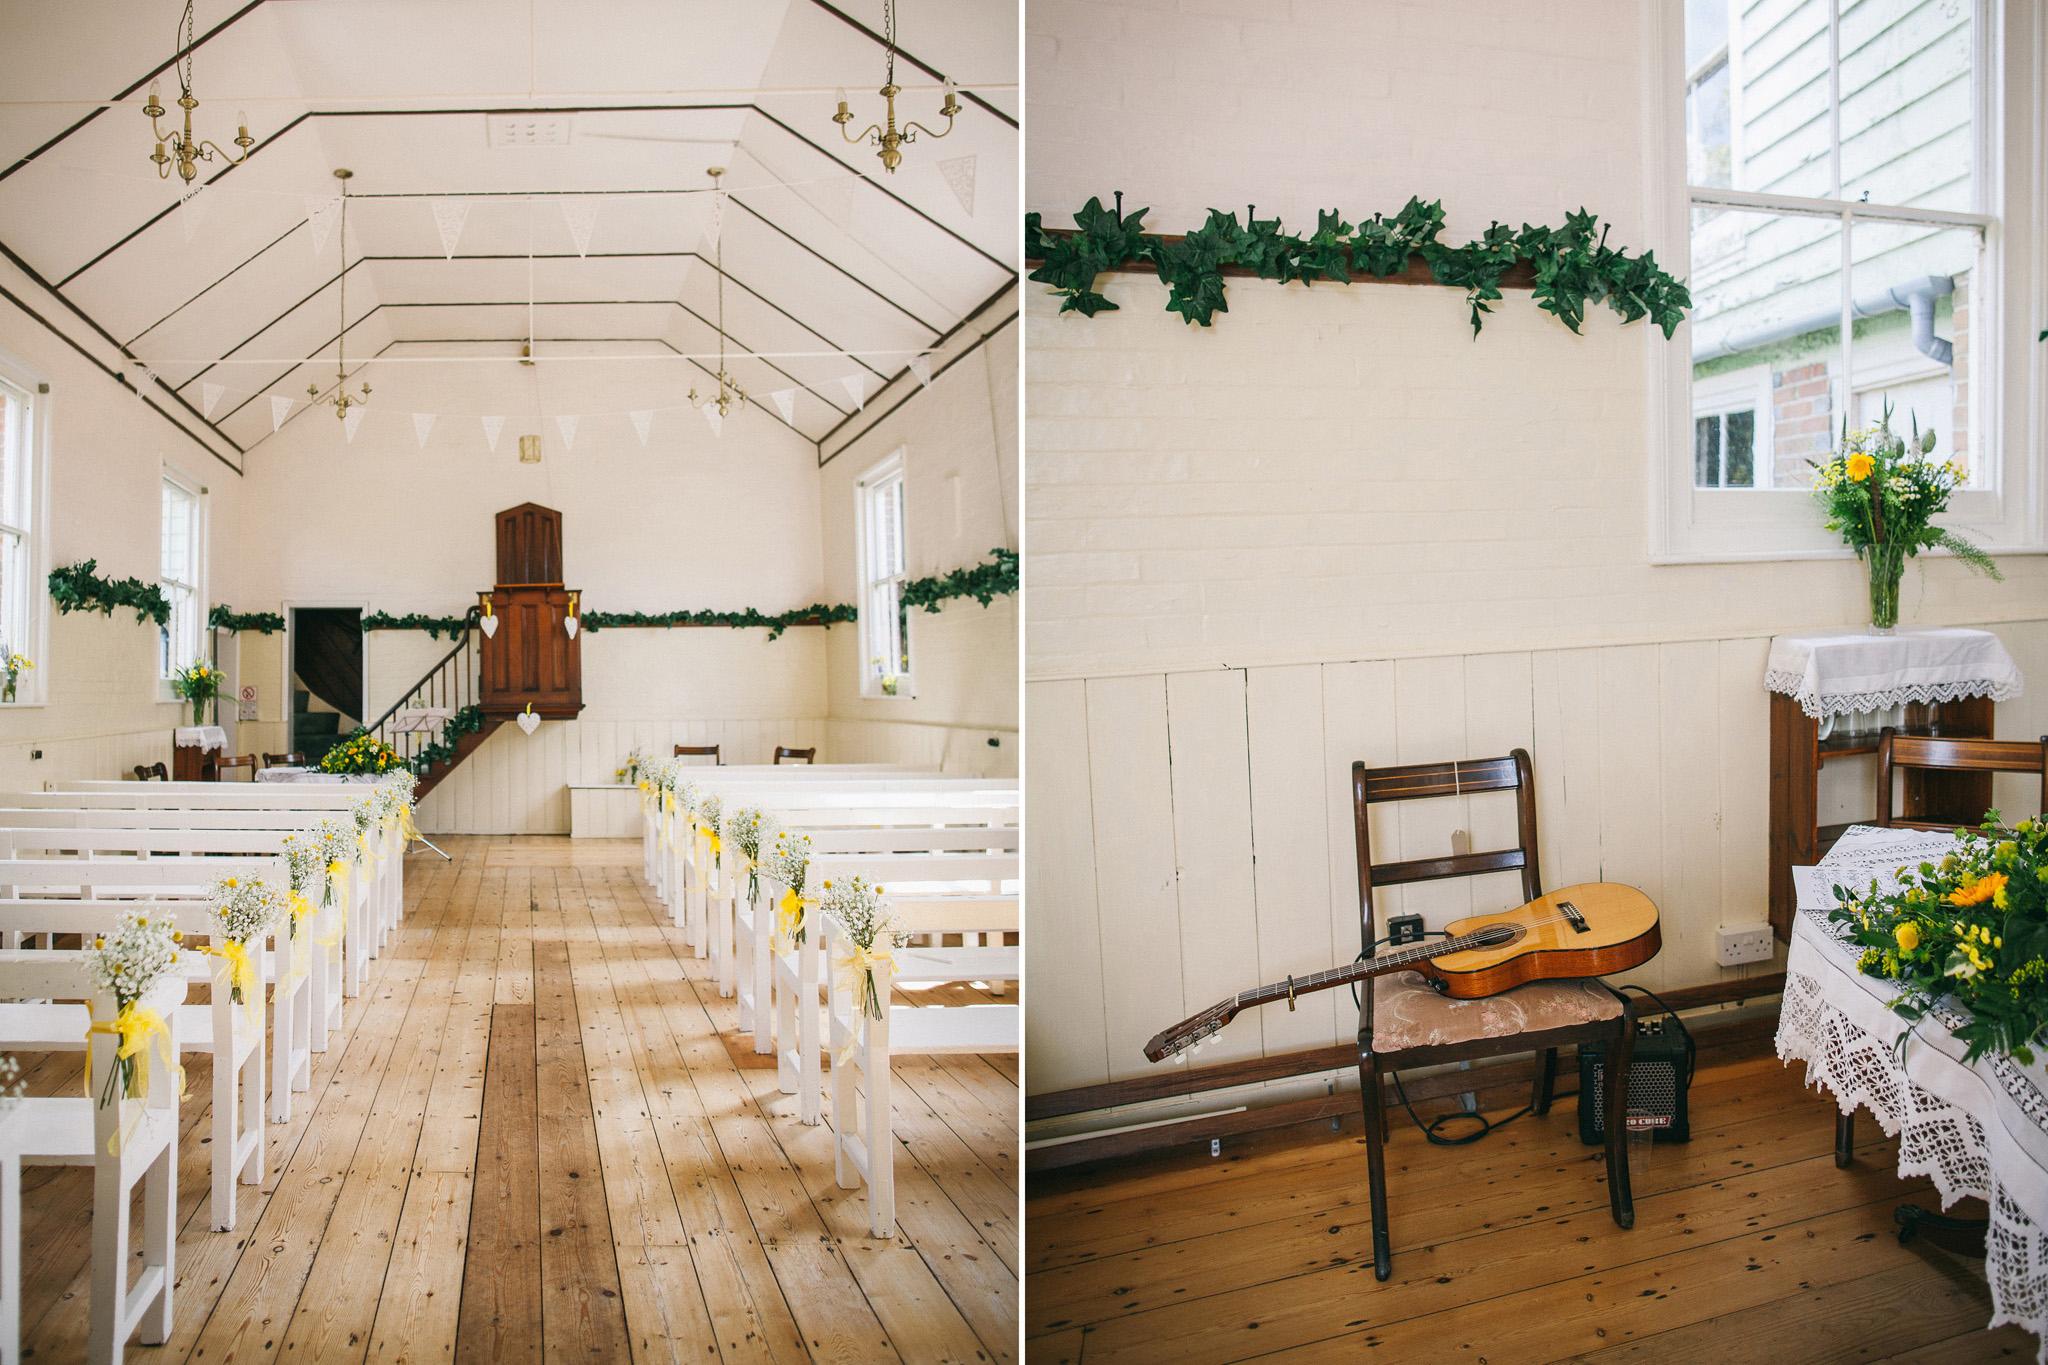 chantry_sussex_barn_wedding_297.jpg